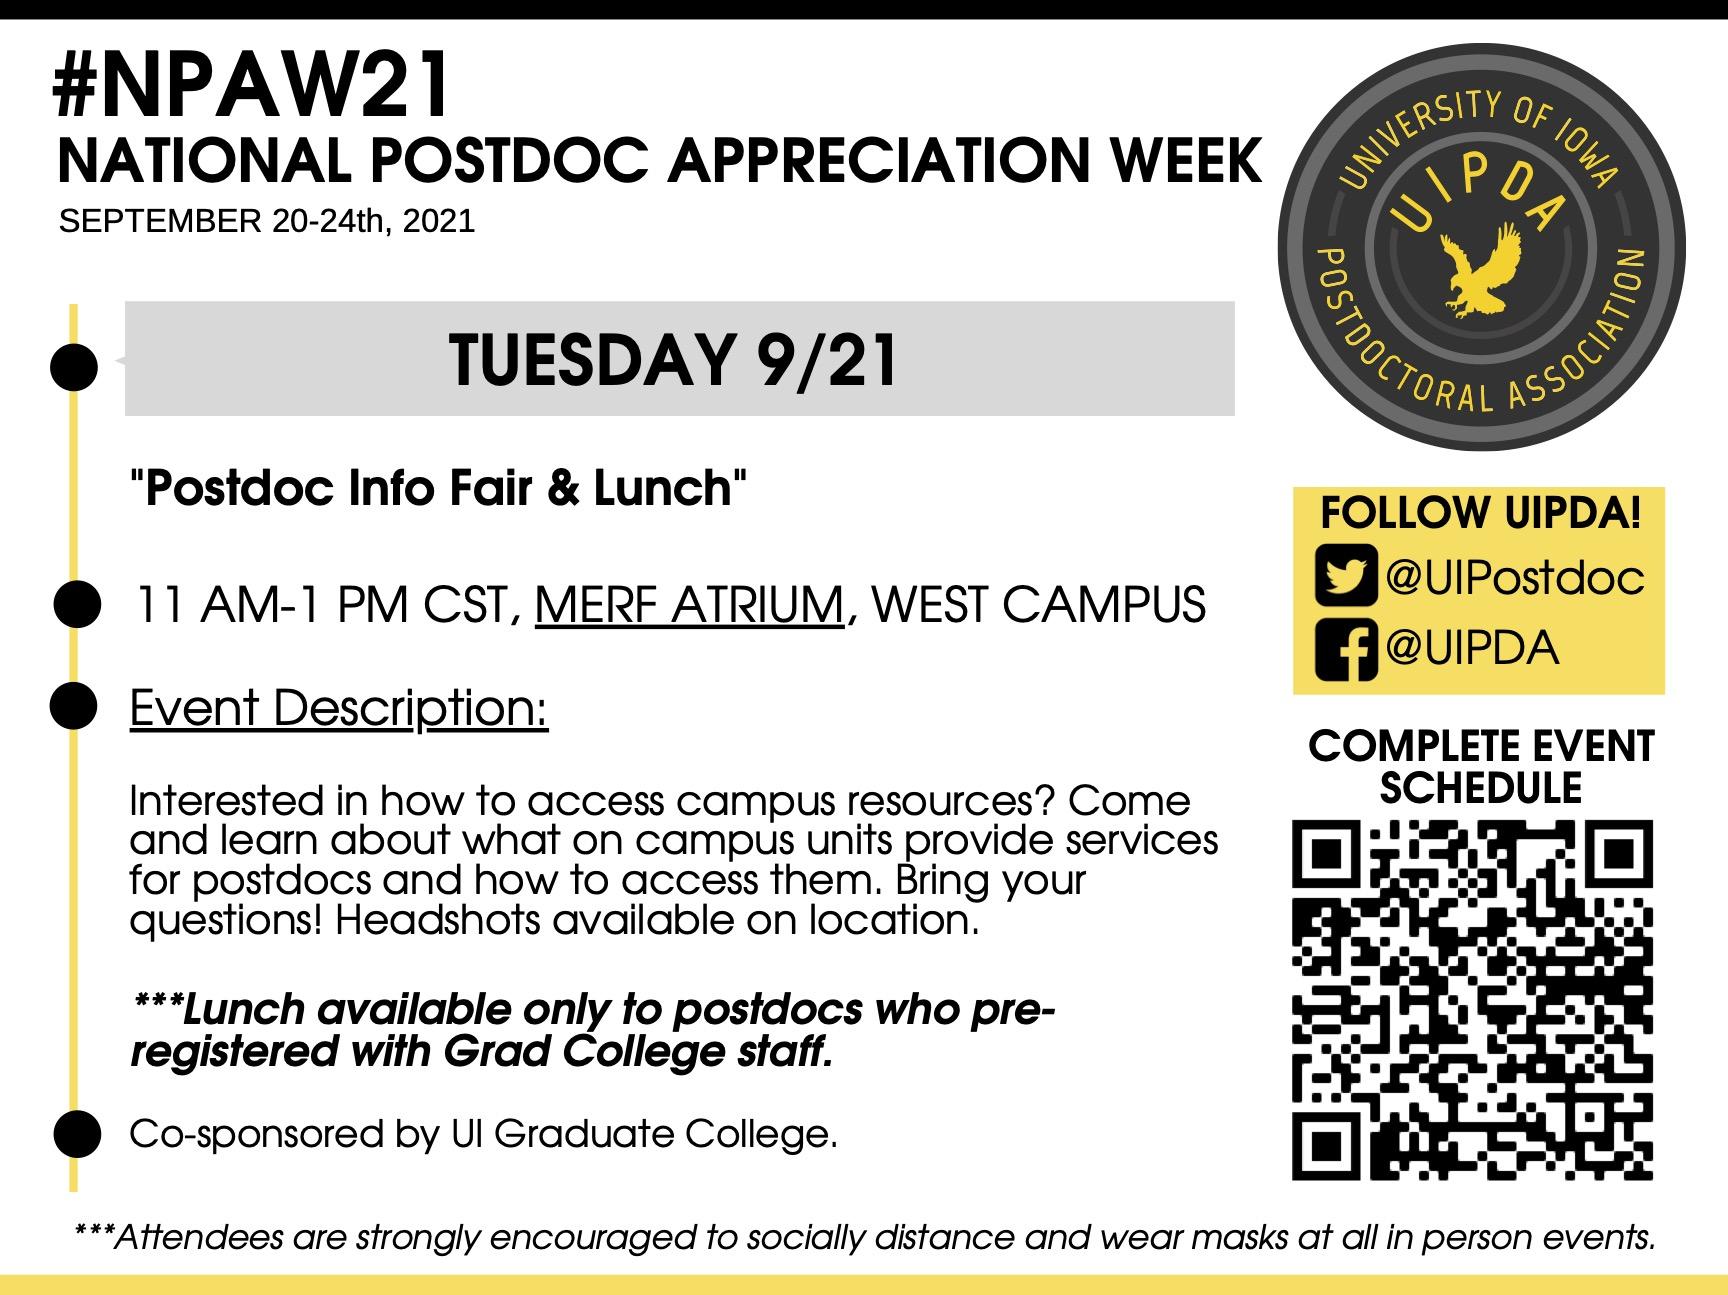 Tuesday 9/21: Postdoc Info Fair & Lunch